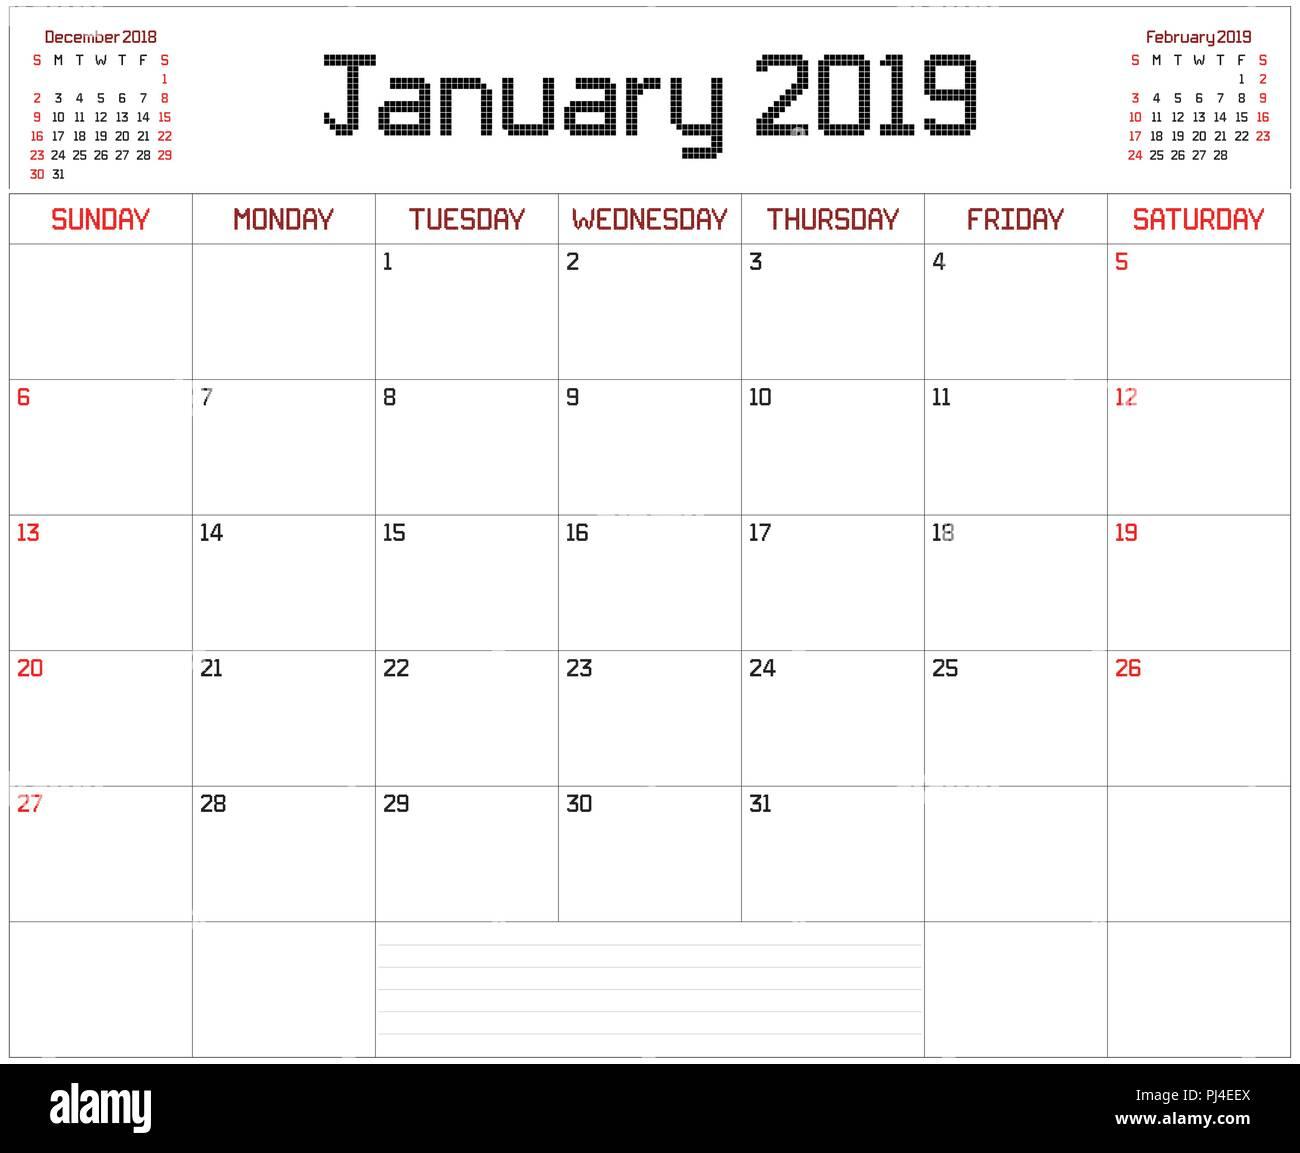 Calendario Gennaio.2019 Gennaio Planner Un Pianificatore Mensile Calendario